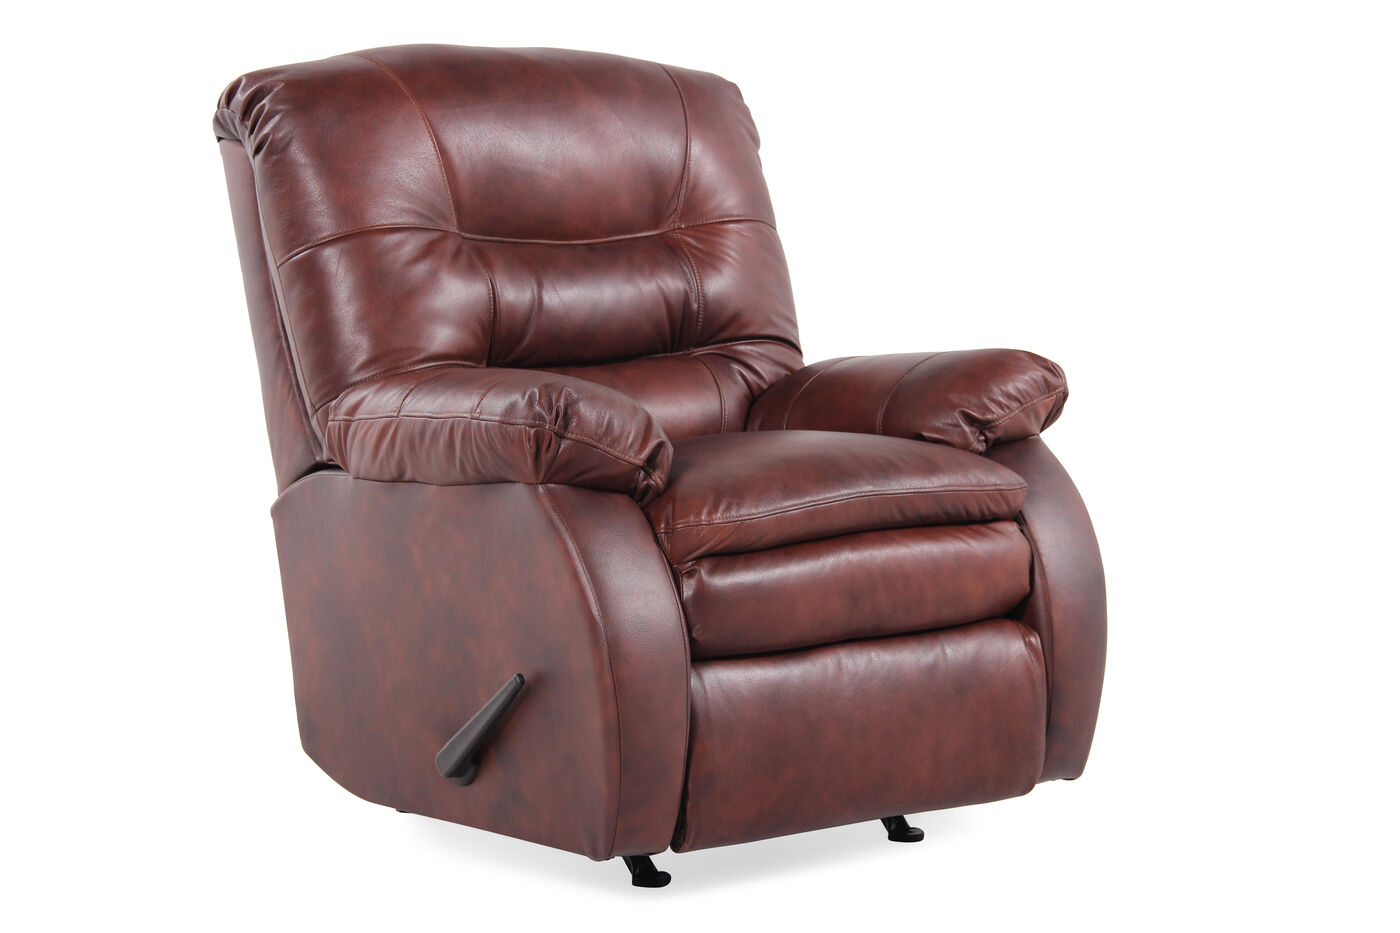 Lane zero gravity laredo bark rocking recliner mathis - Zero gravity recliner chair for living room ...